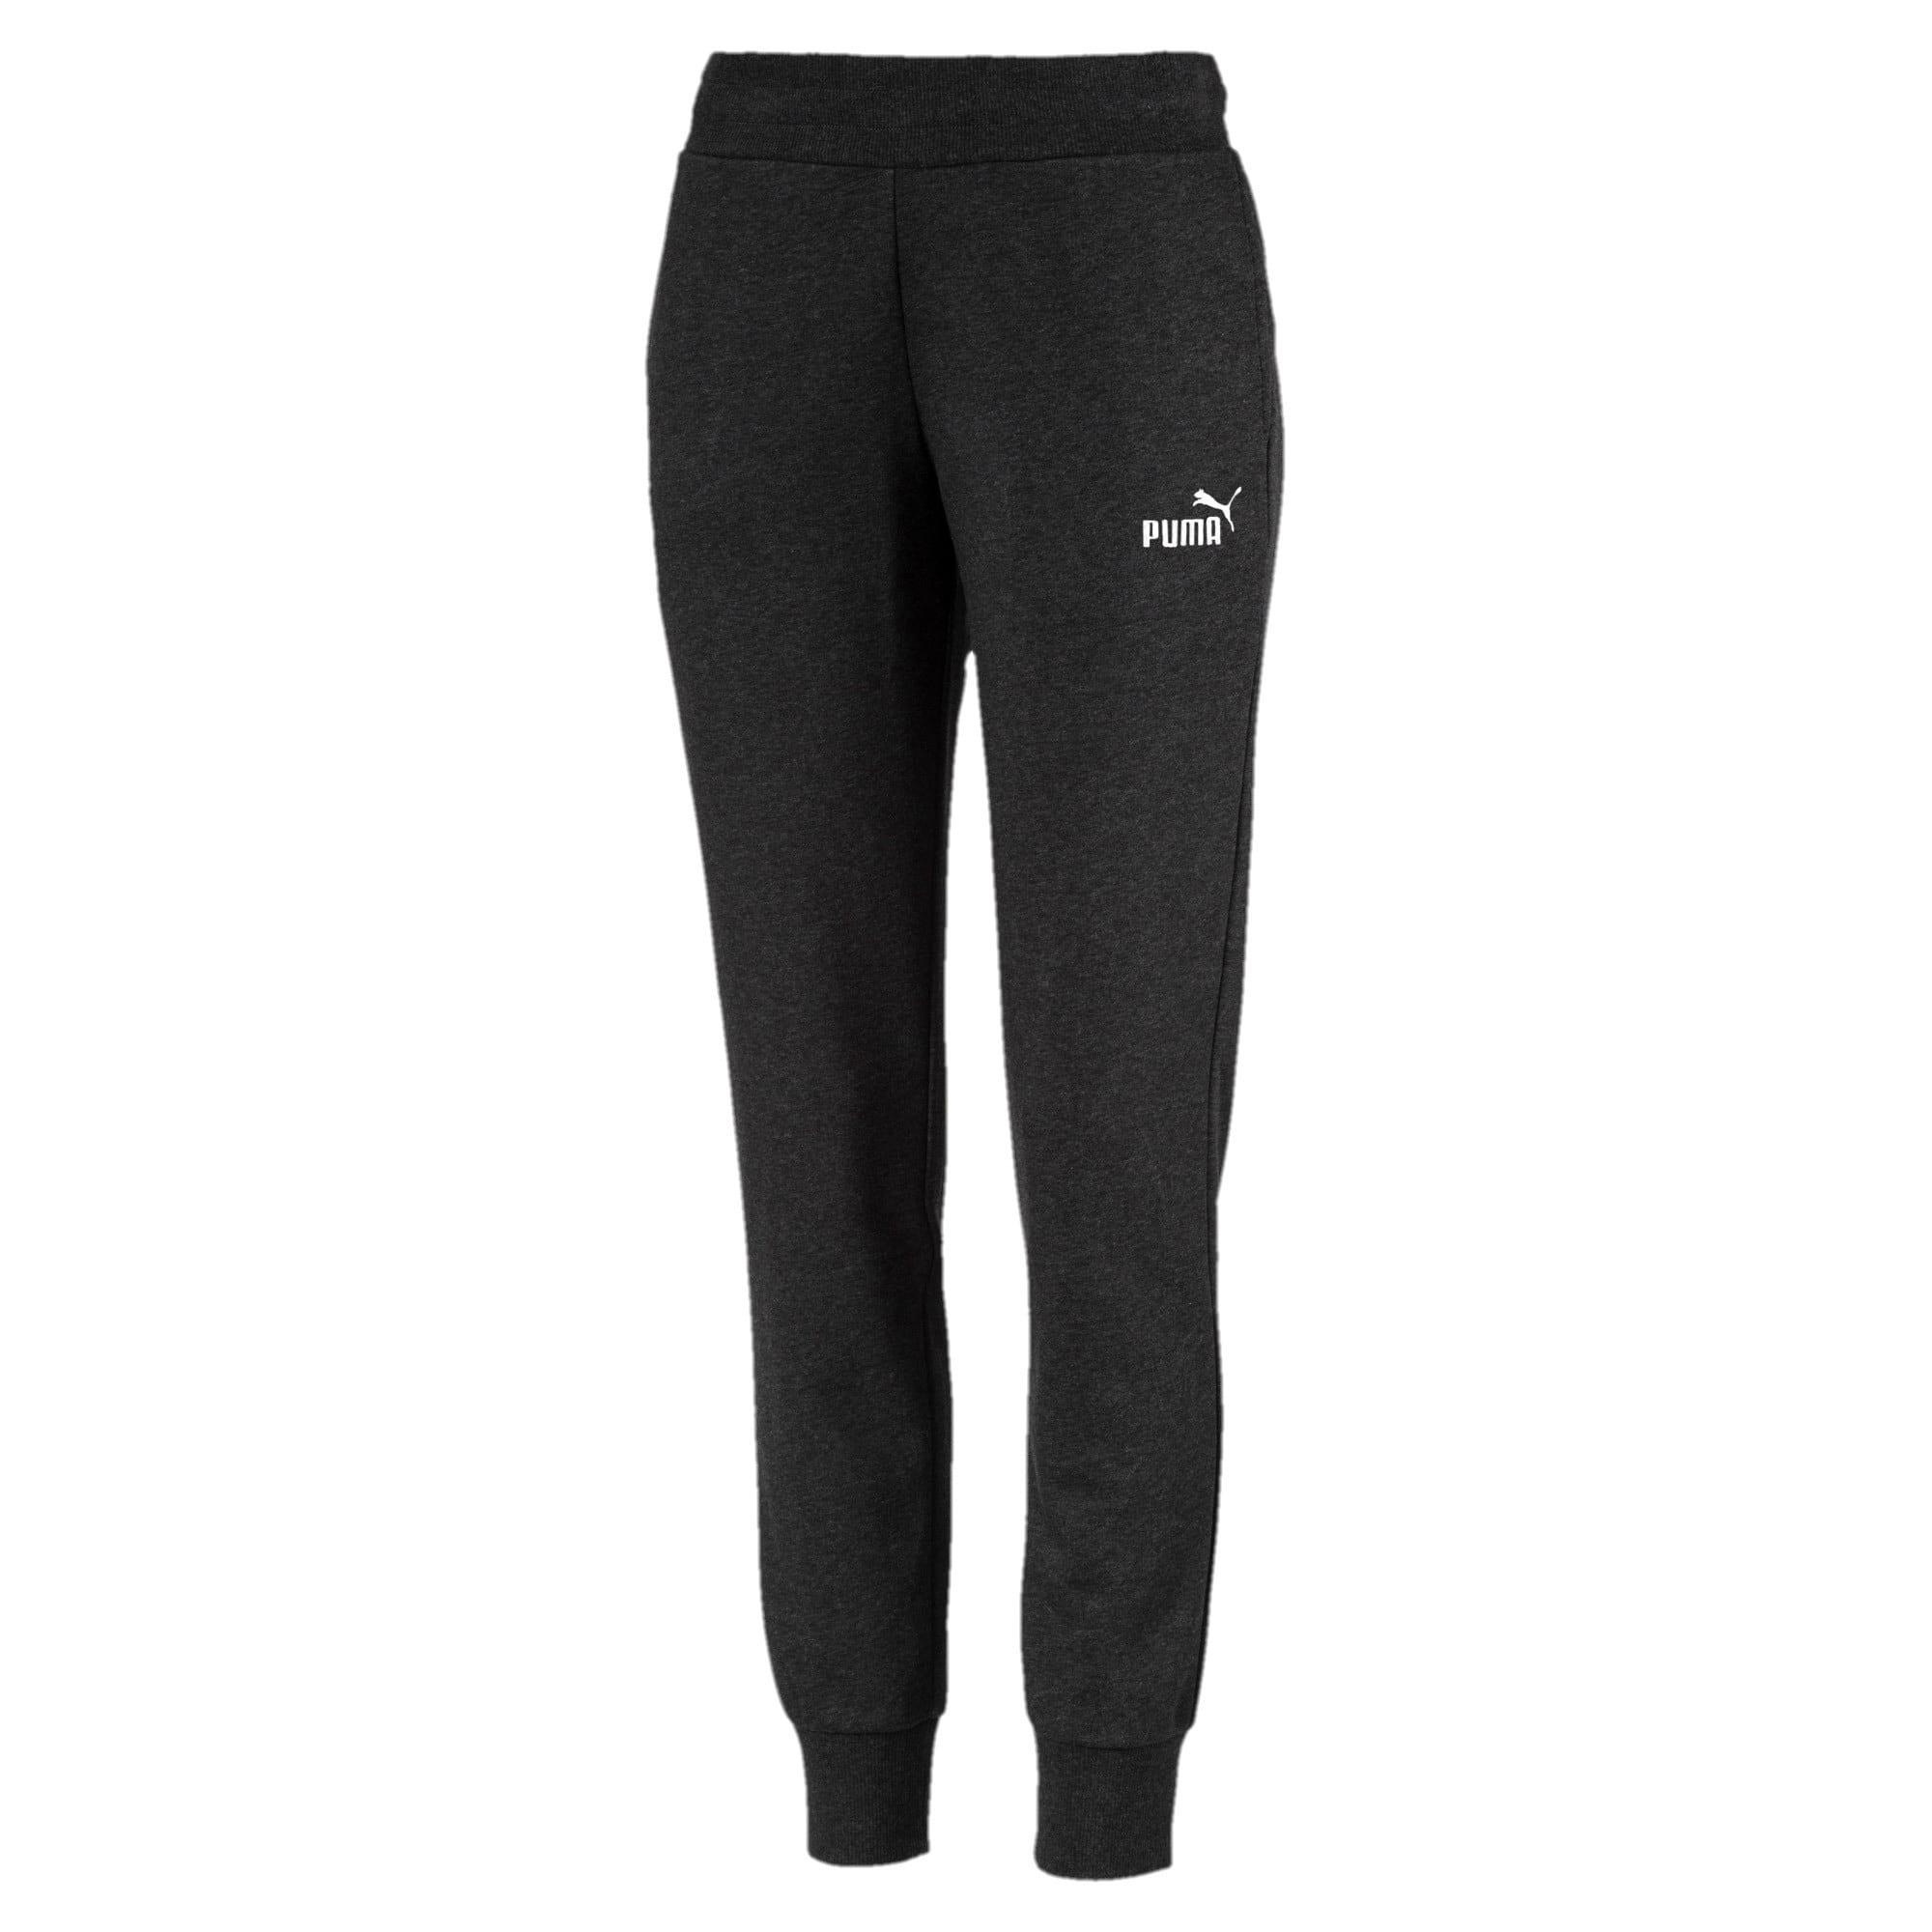 Thumbnail 1 of Essentials Women's Sweatpants, Dark Gray Heather, medium